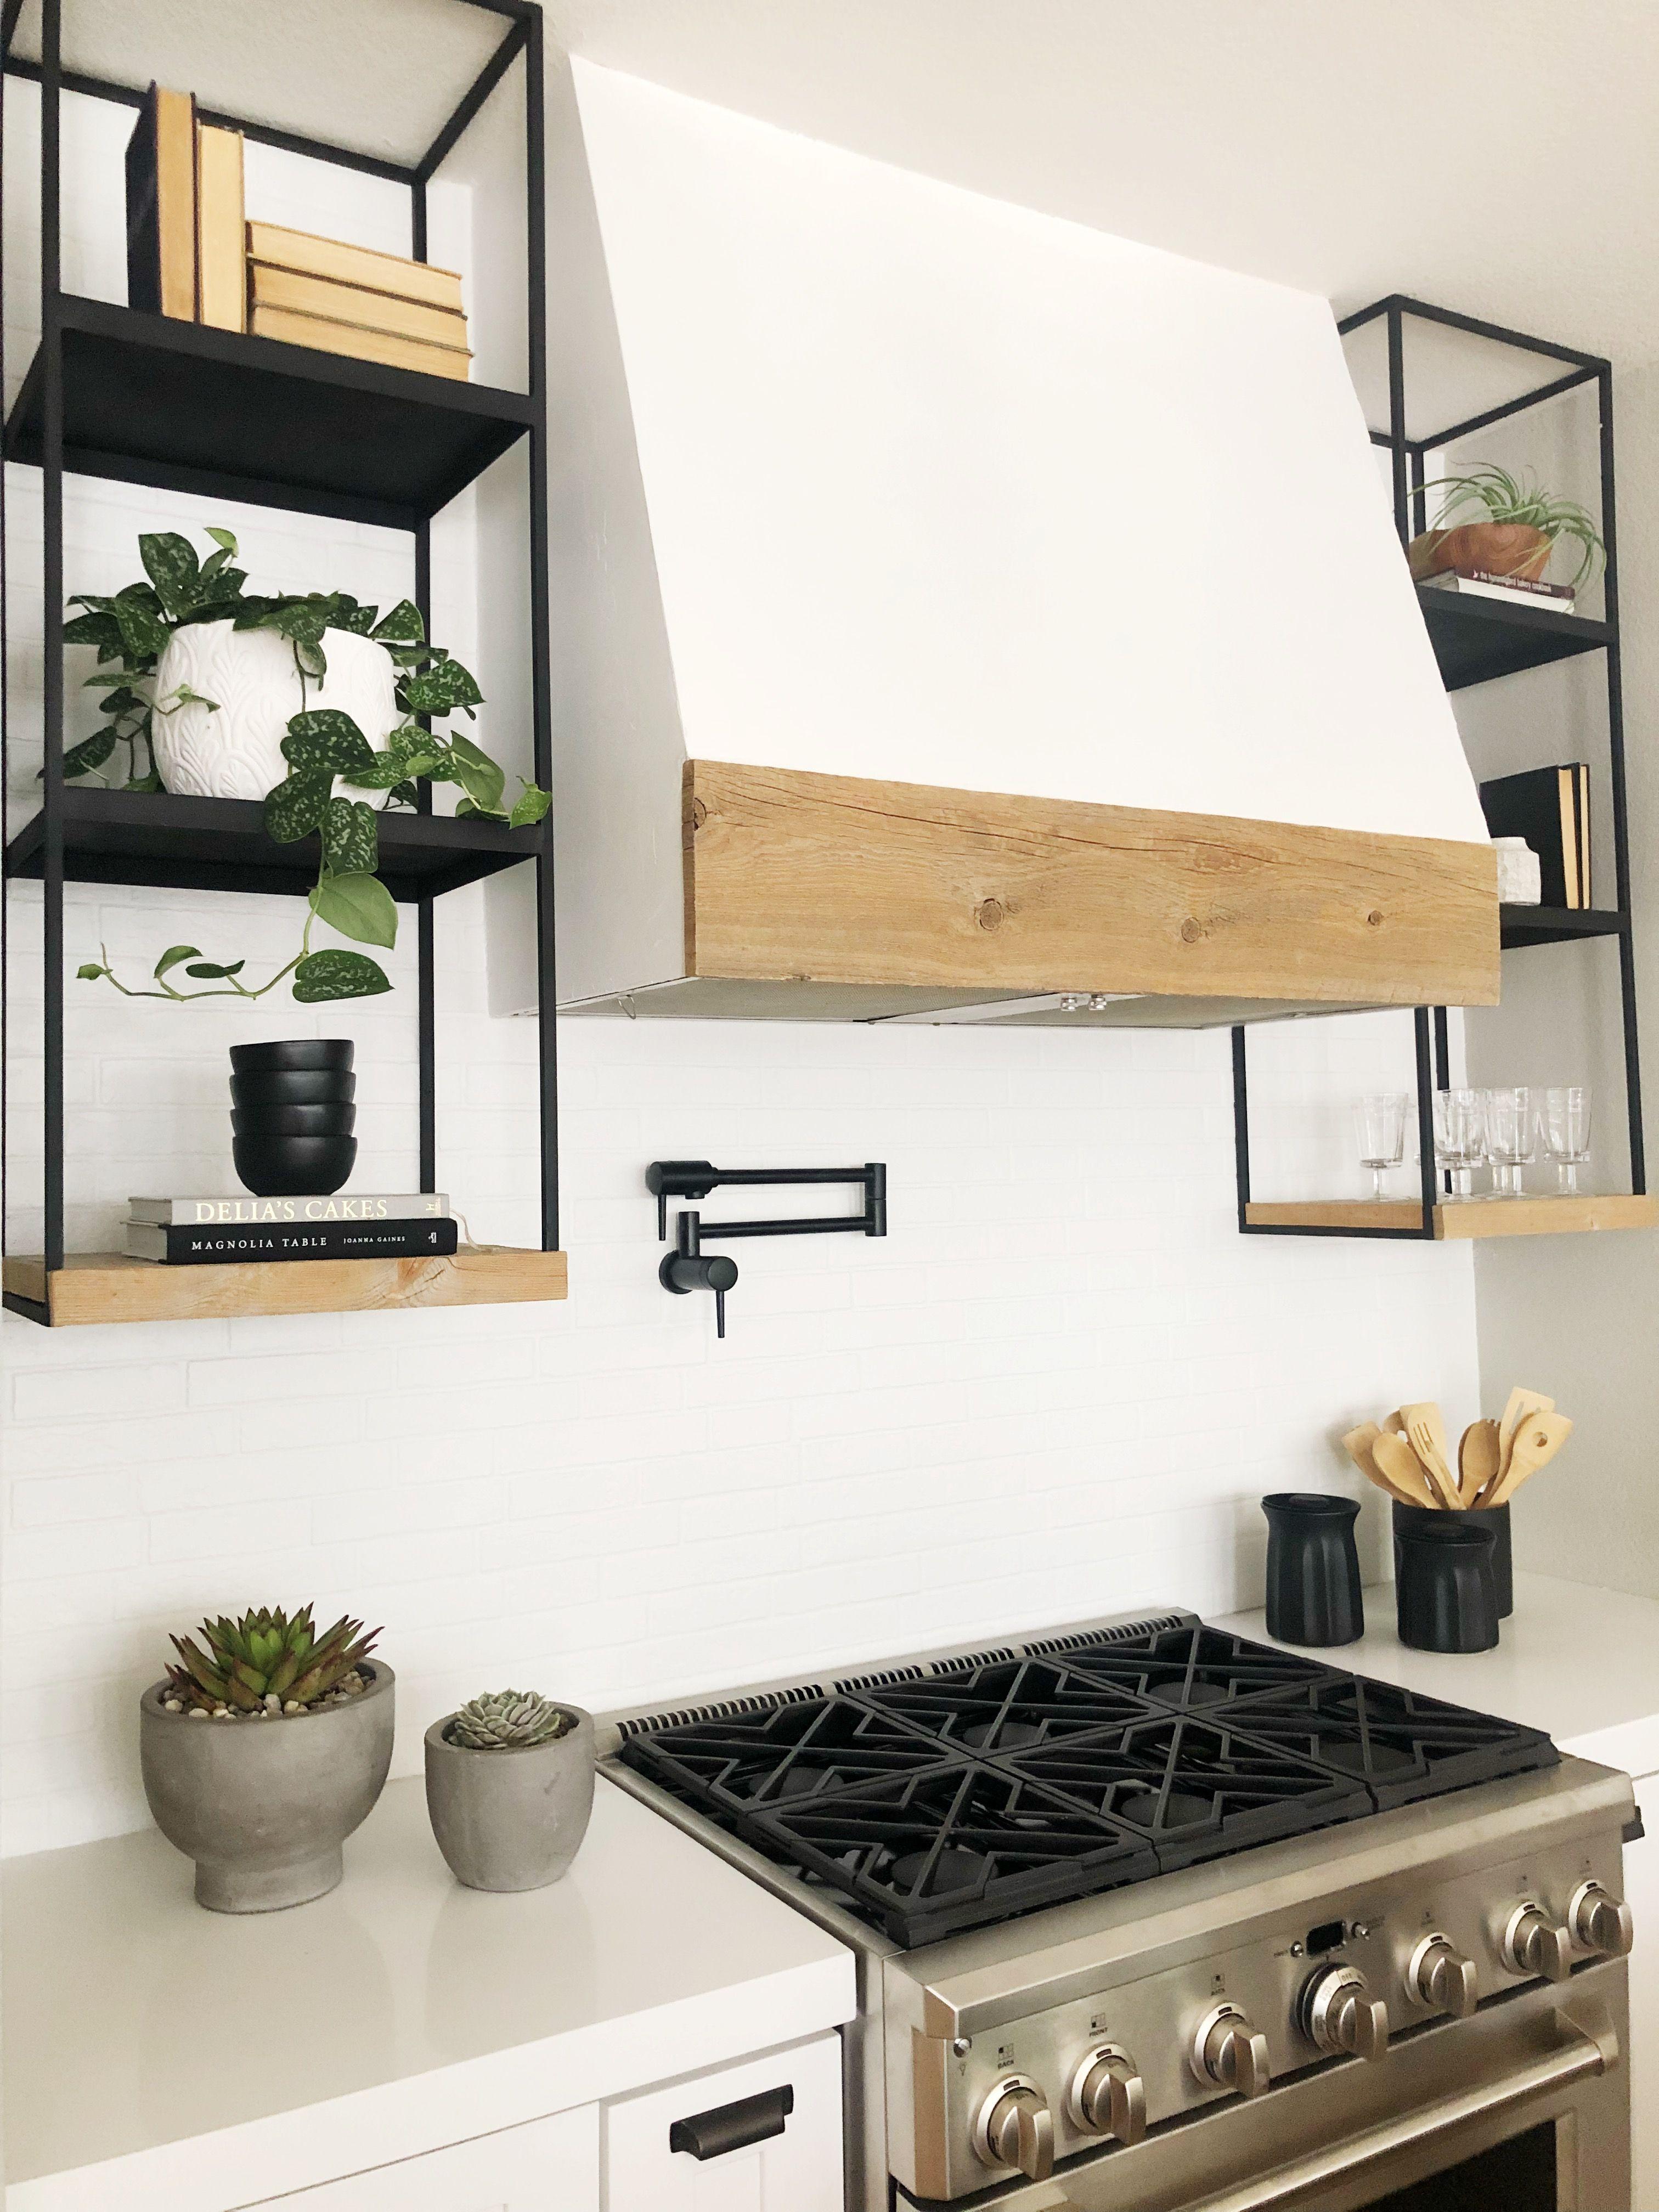 plaster kitchen hood black open metal shelving kitchen shelf design open kitchen shelves on kitchen decor open shelves id=85143